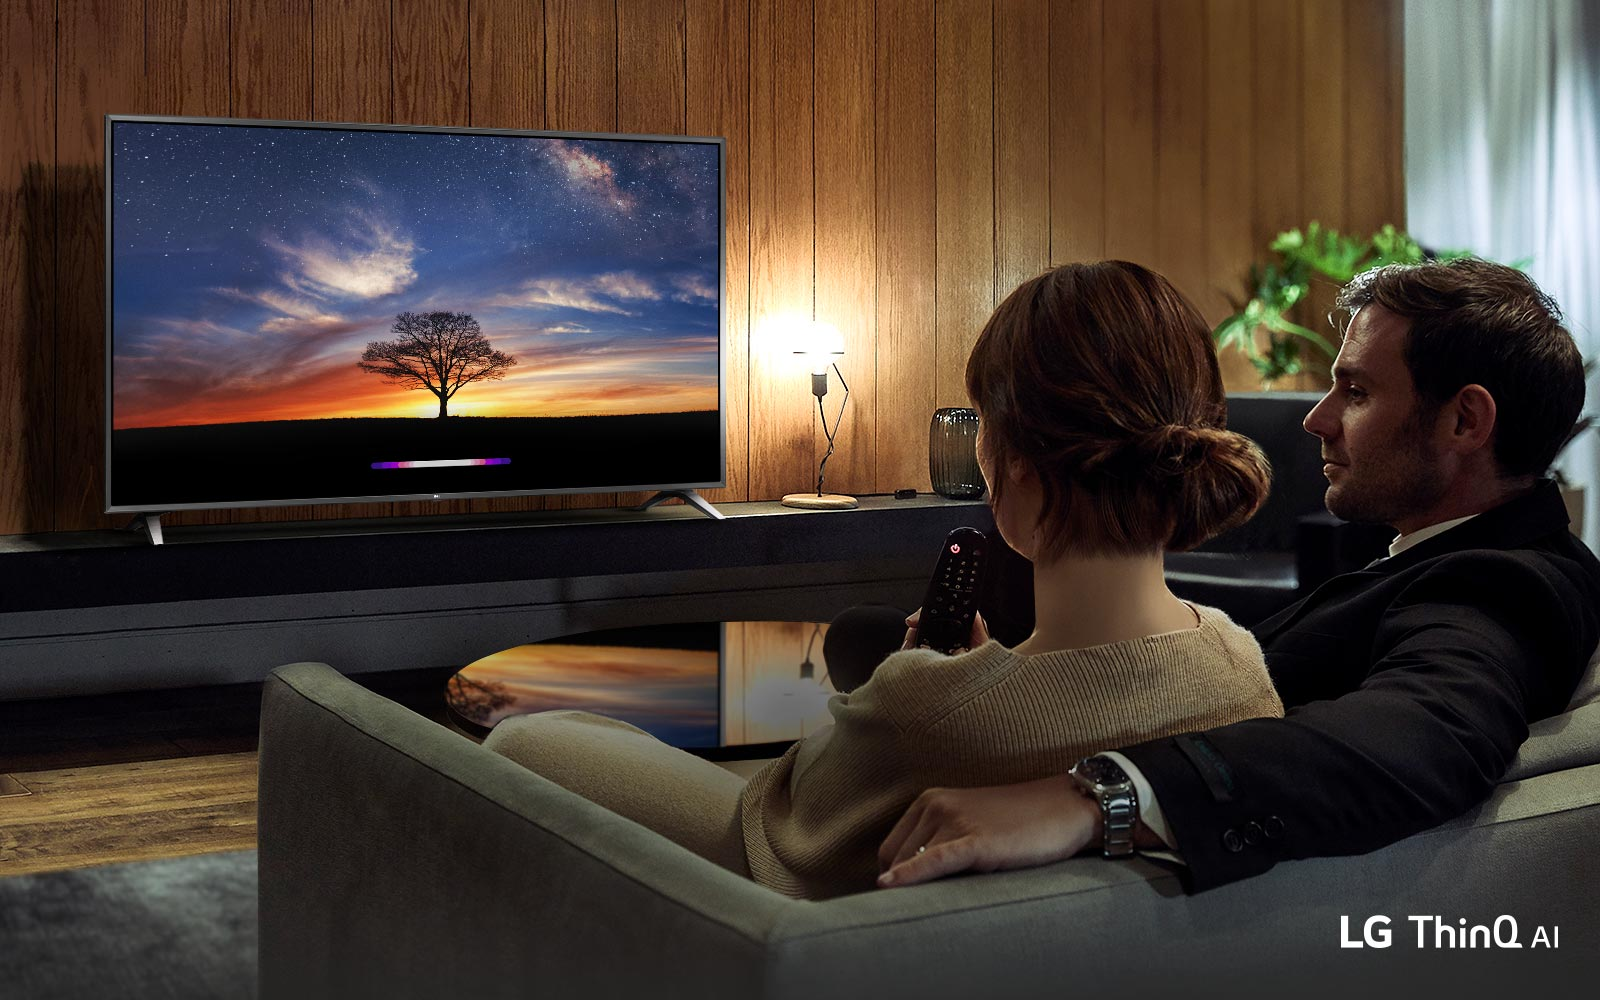 TV-UHD-86-UM75-01-AI-ThinQ-Desktop